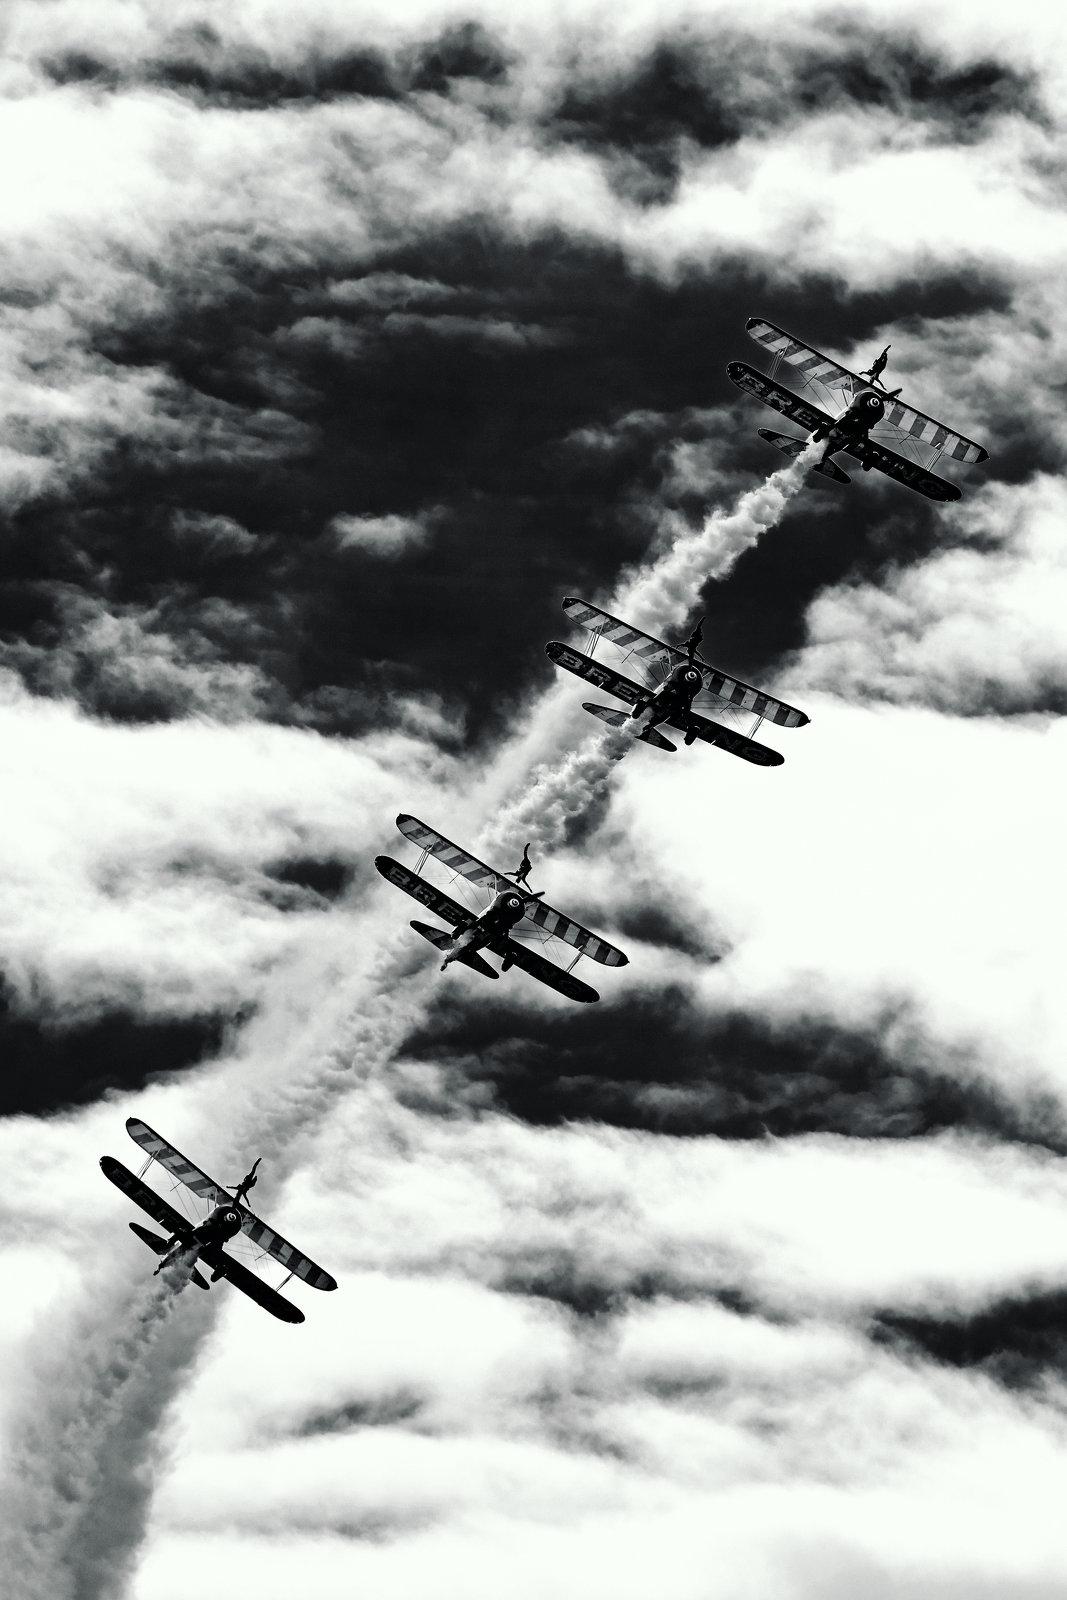 Farnborough Airshow July 2016 XPro2 Wingwalkers 9 mono.jpg